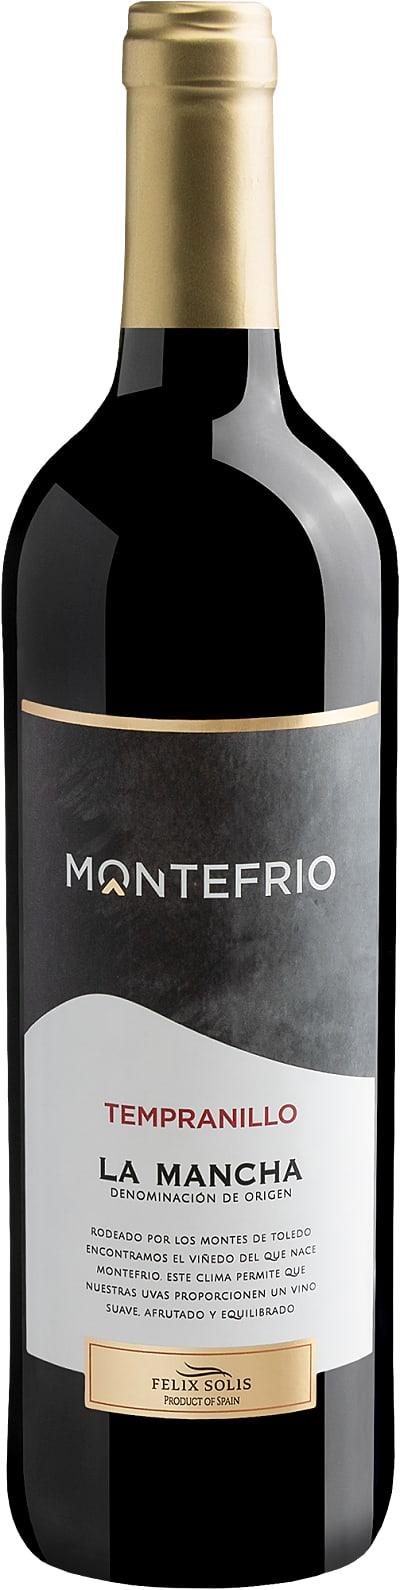 Montefrio Tempranillo La Mancha D.O.